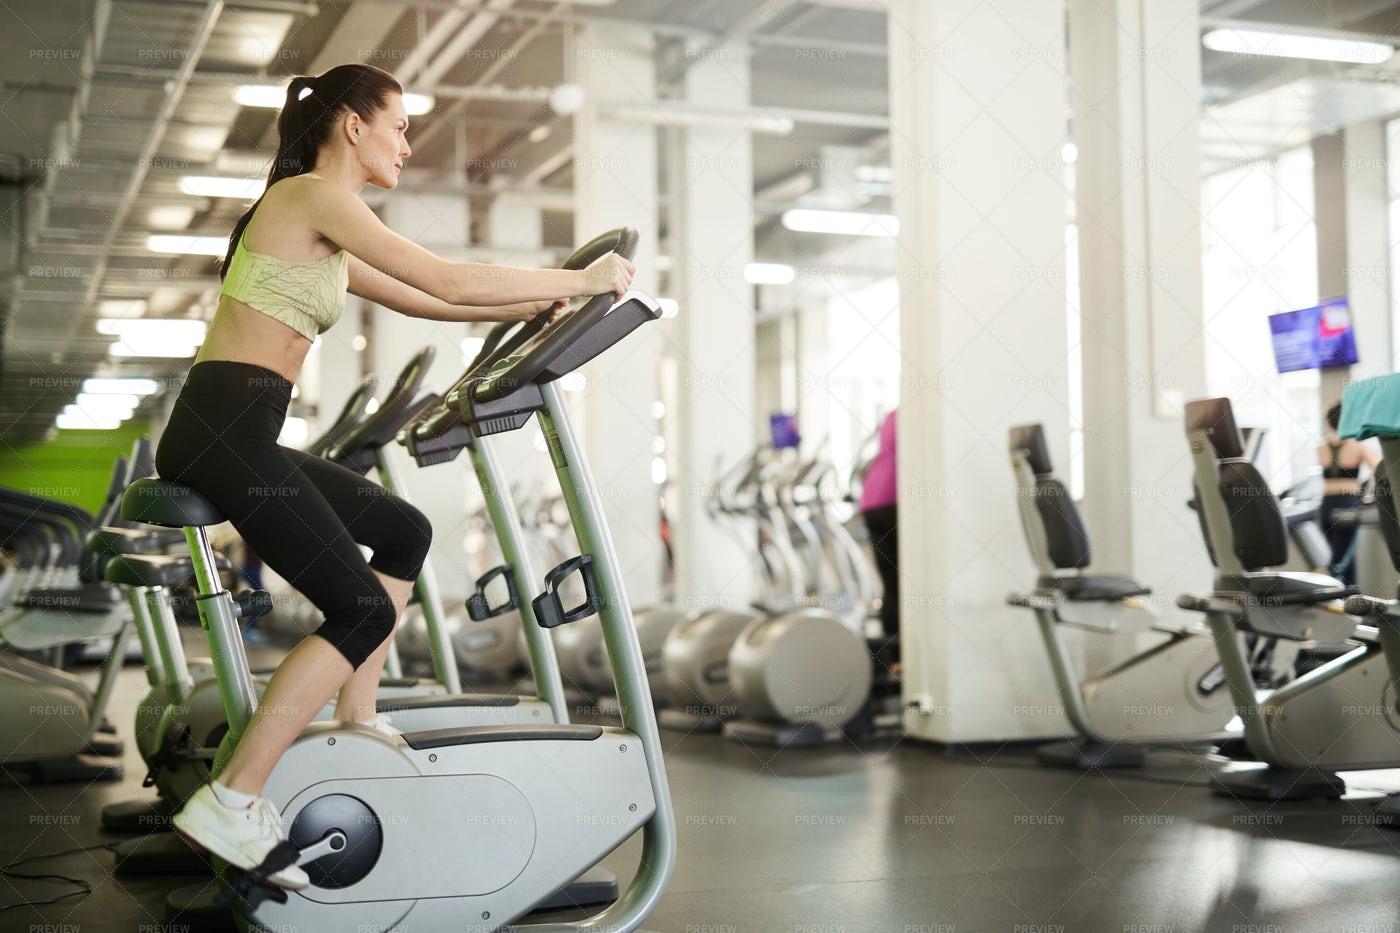 Cardio Workout In Gym: Stock Photos